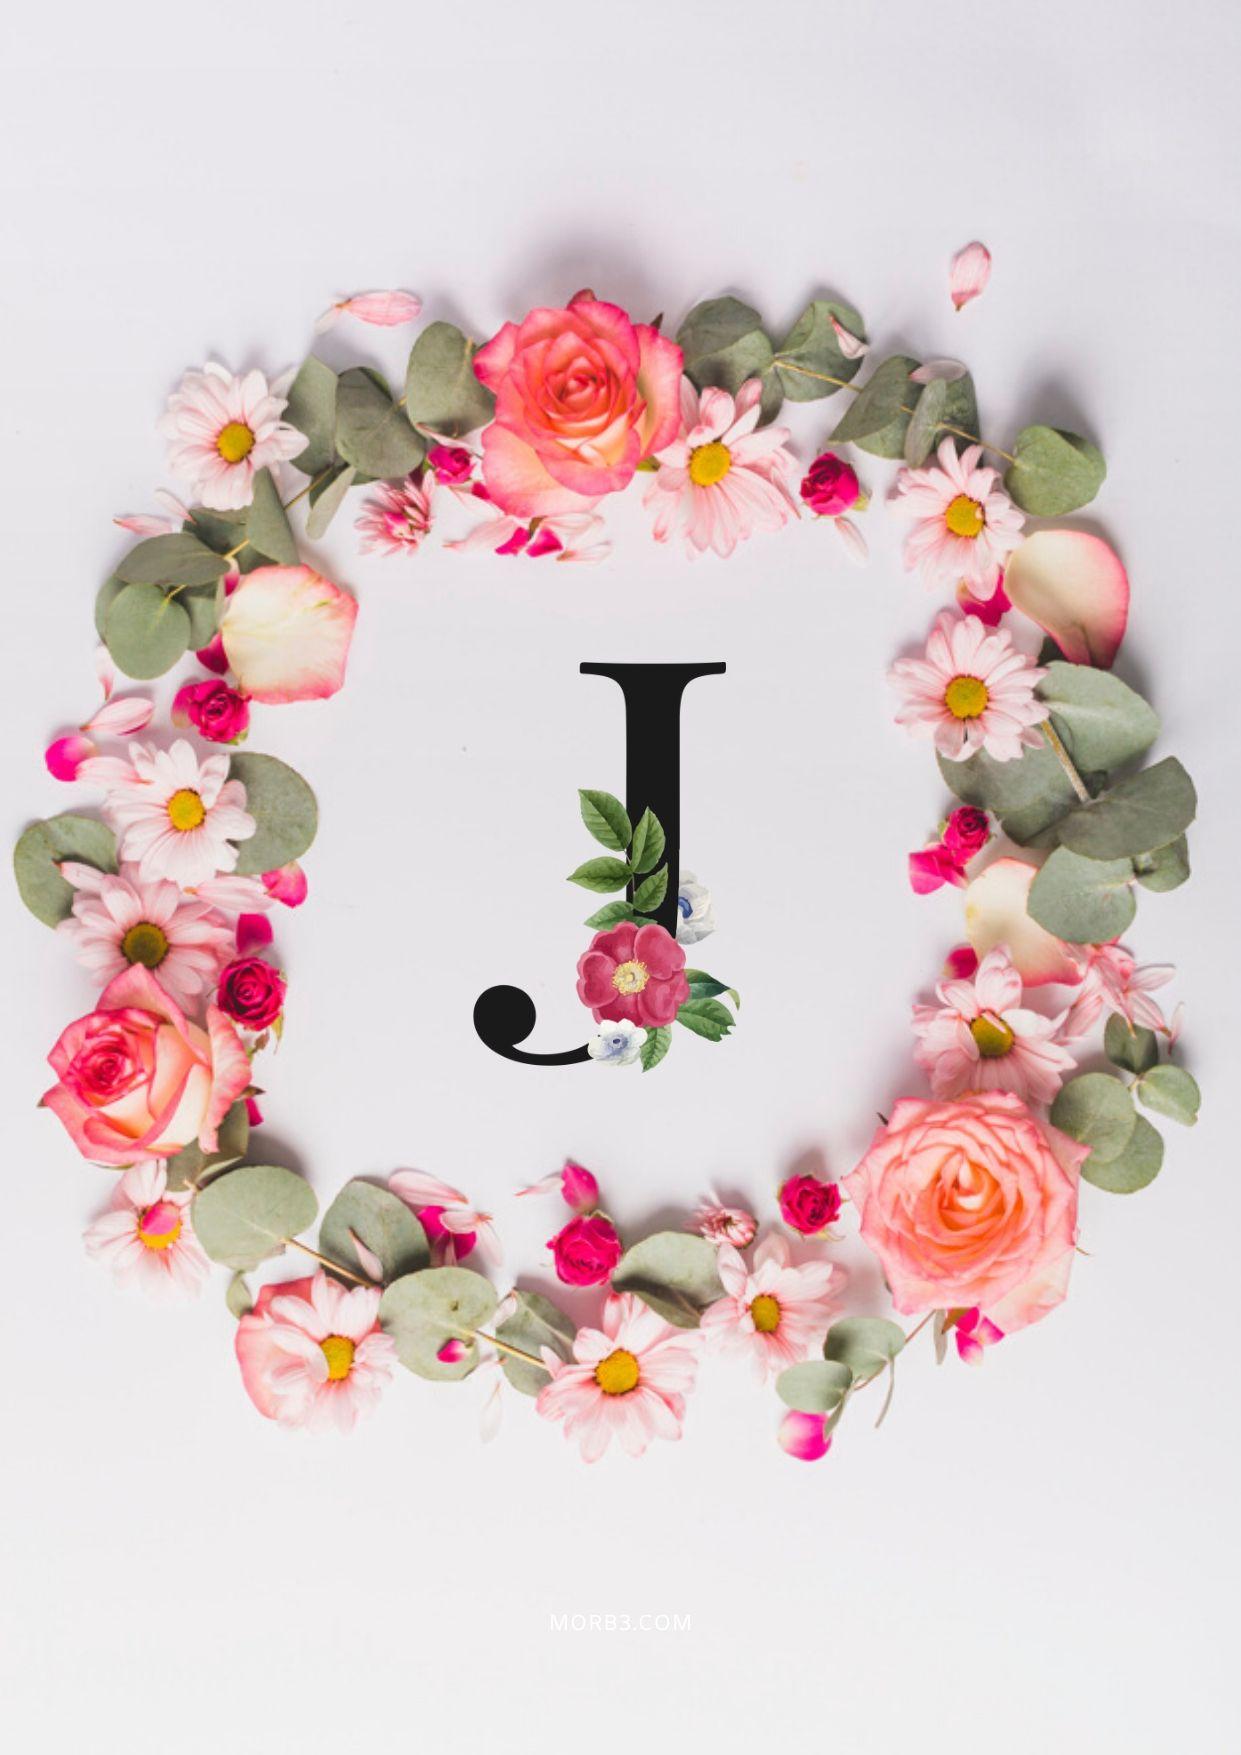 صور حرف J خلفيات حرف J خلفيات حرف J رومانسية اجمل حرف J في العالم حرف J بالورد حرف J احبك حرف J في قلوب حرف J مع كلام حب خلفيات حرف